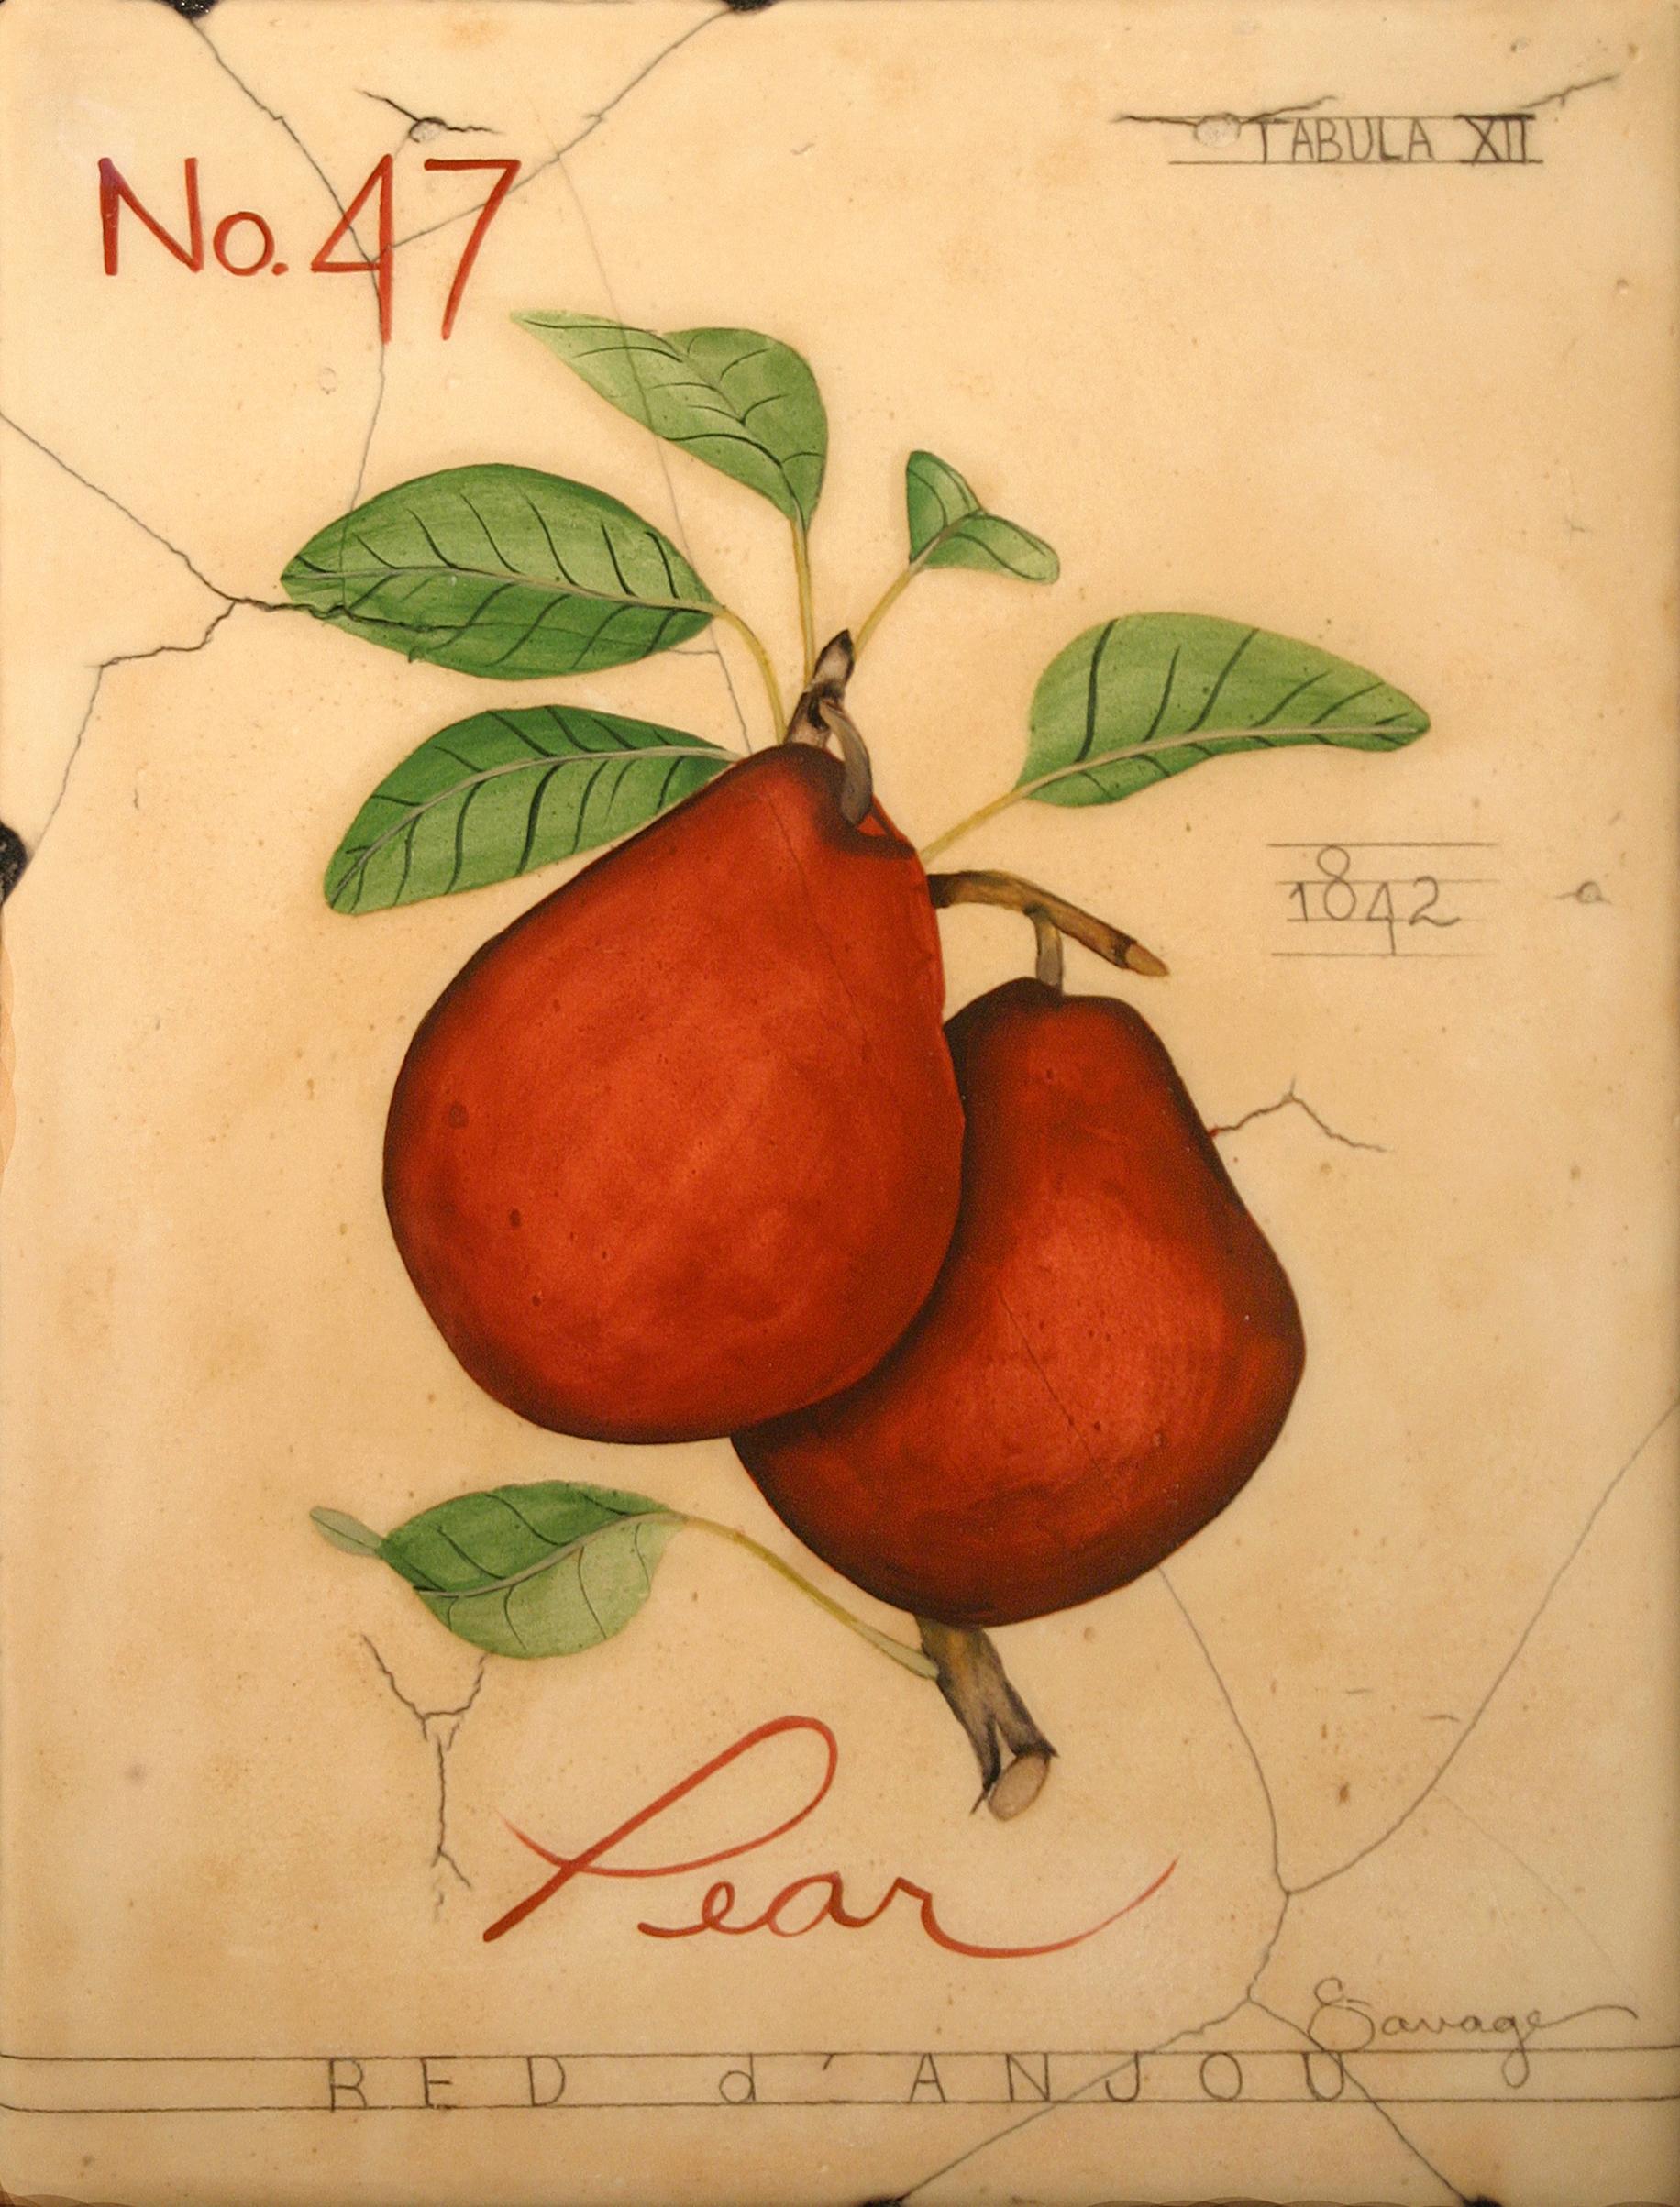 No. 47 Pear